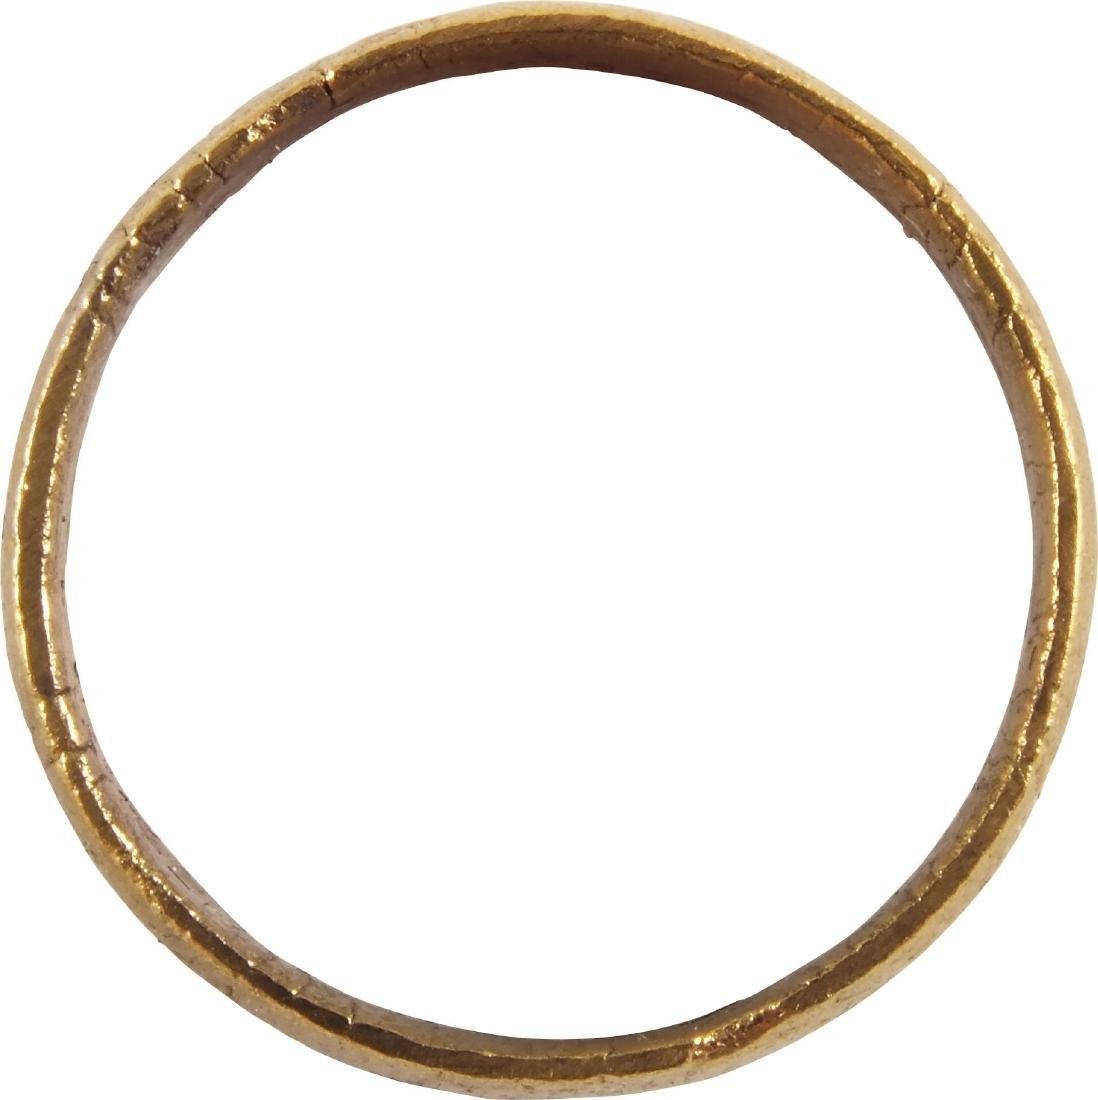 ANCIENT VIKING PINKY RING C.900 AD - 2